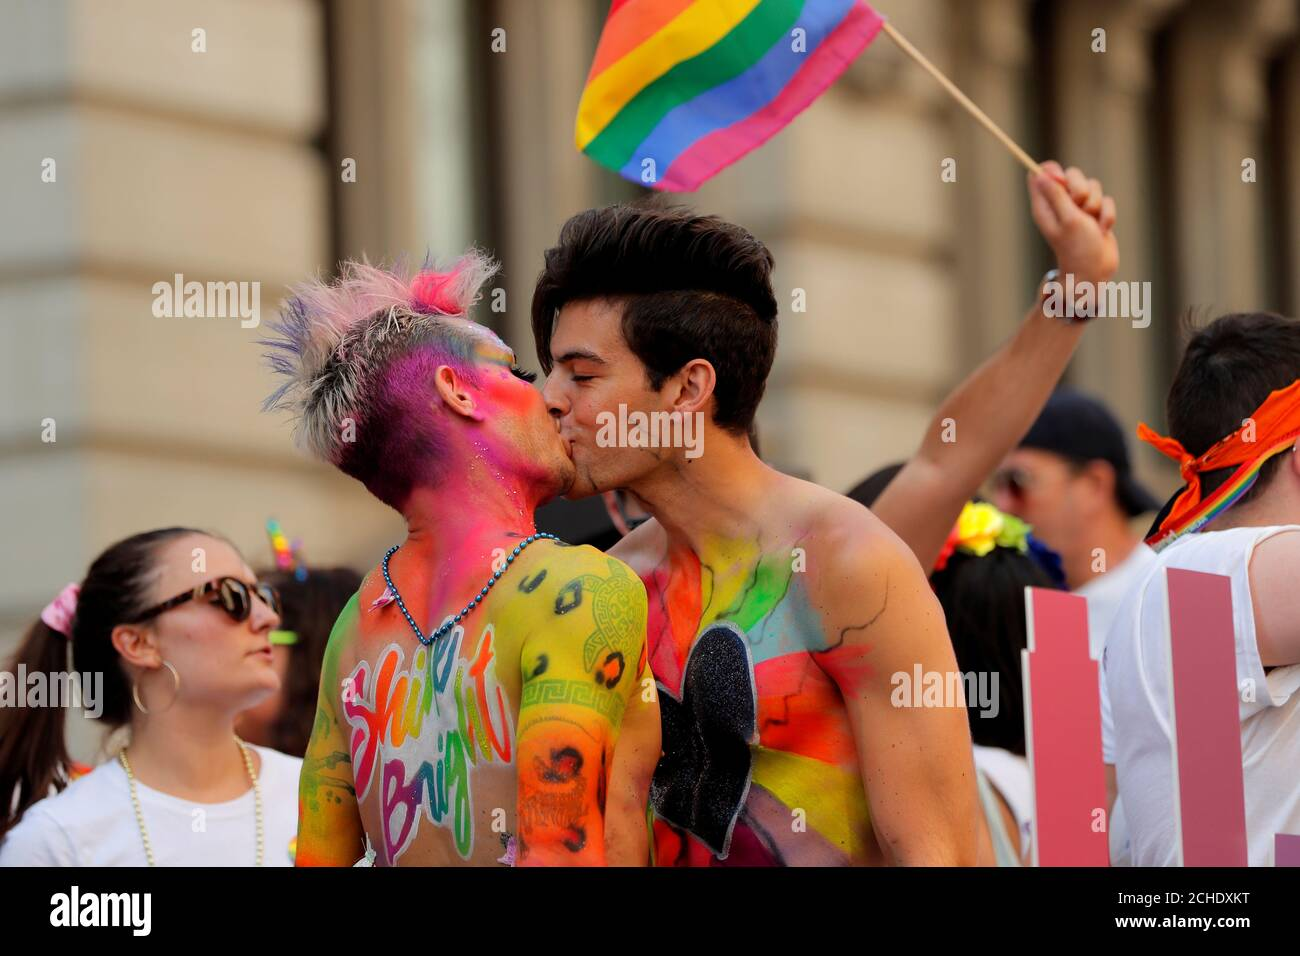 rencontre amoureuse gay parade a Saint Joseph